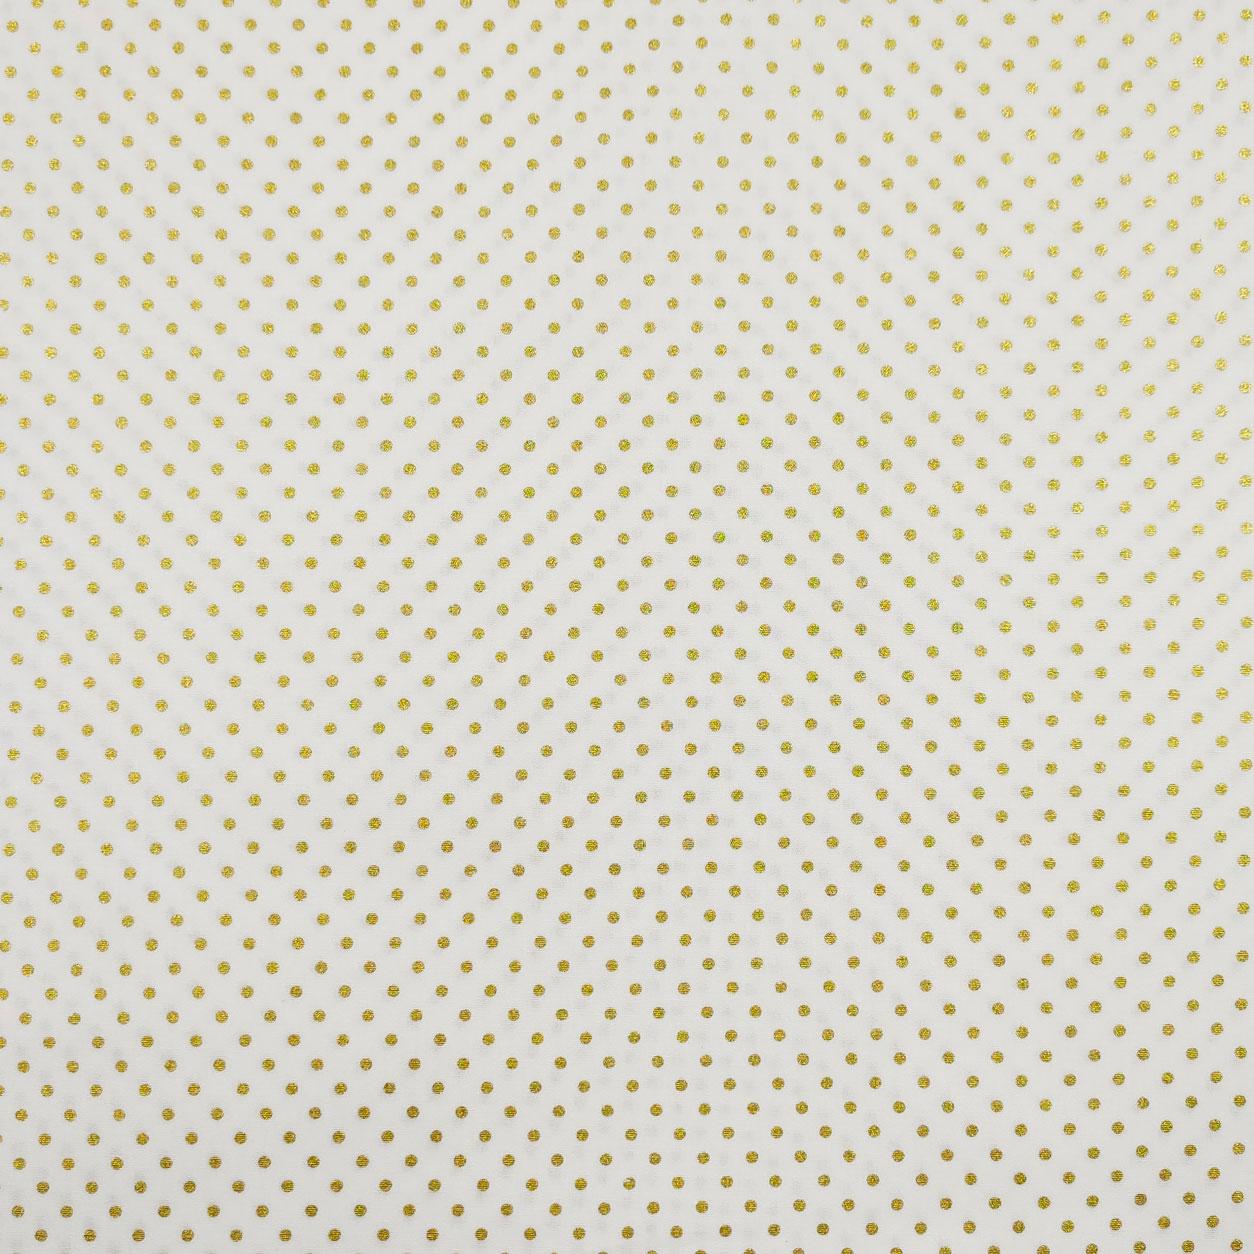 Tessuto Cotone Pois Lurex Oro Sfondo Bianco